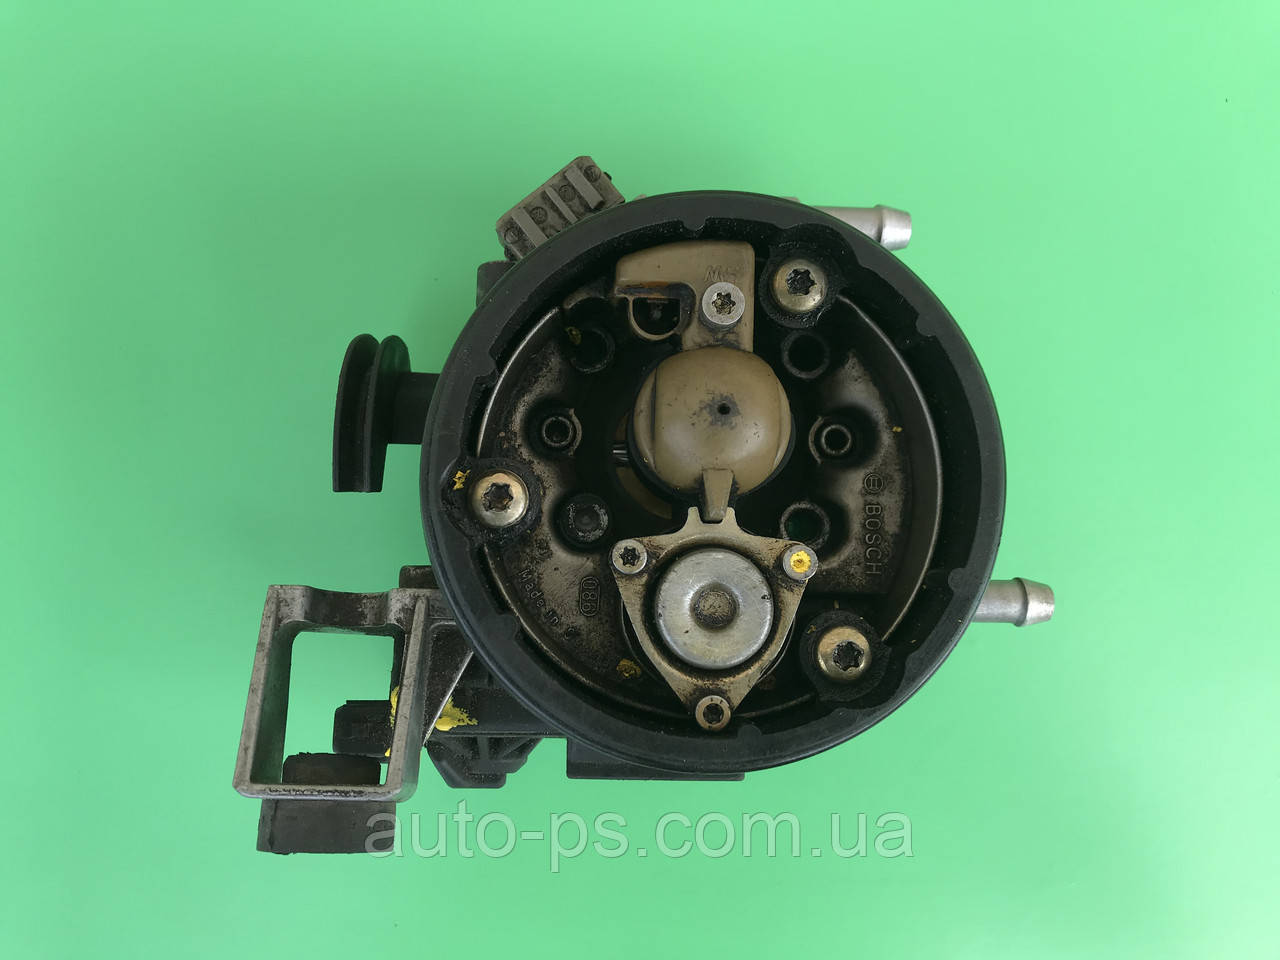 Моноинжектор Peugeot 106 1.4 55kW